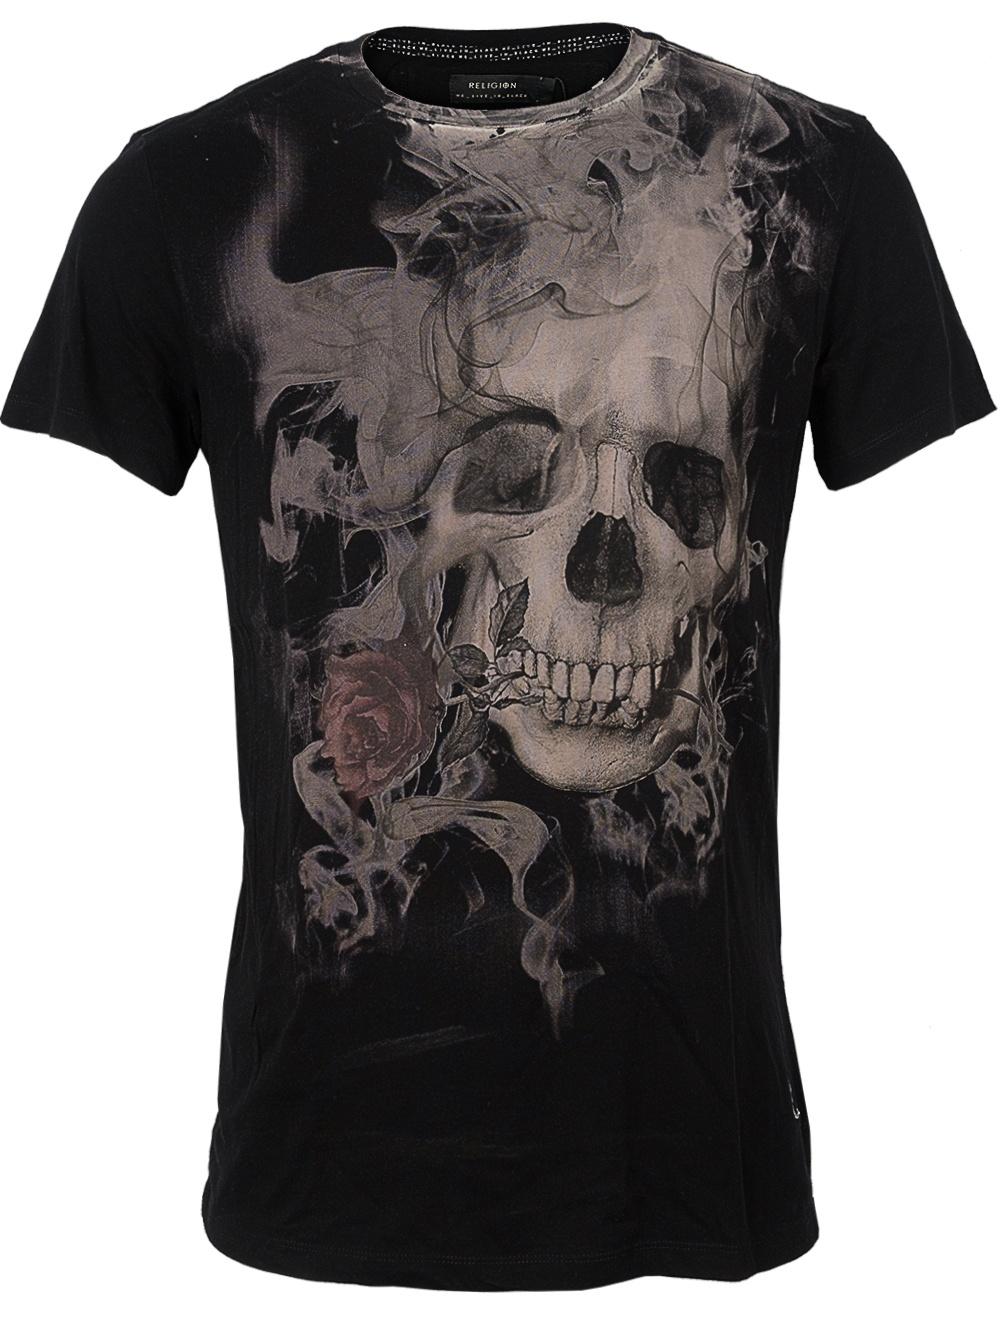 e218d979007540 Herren Shirt Smokey Skull (schwarz) » Religion Shirts günstig online ...